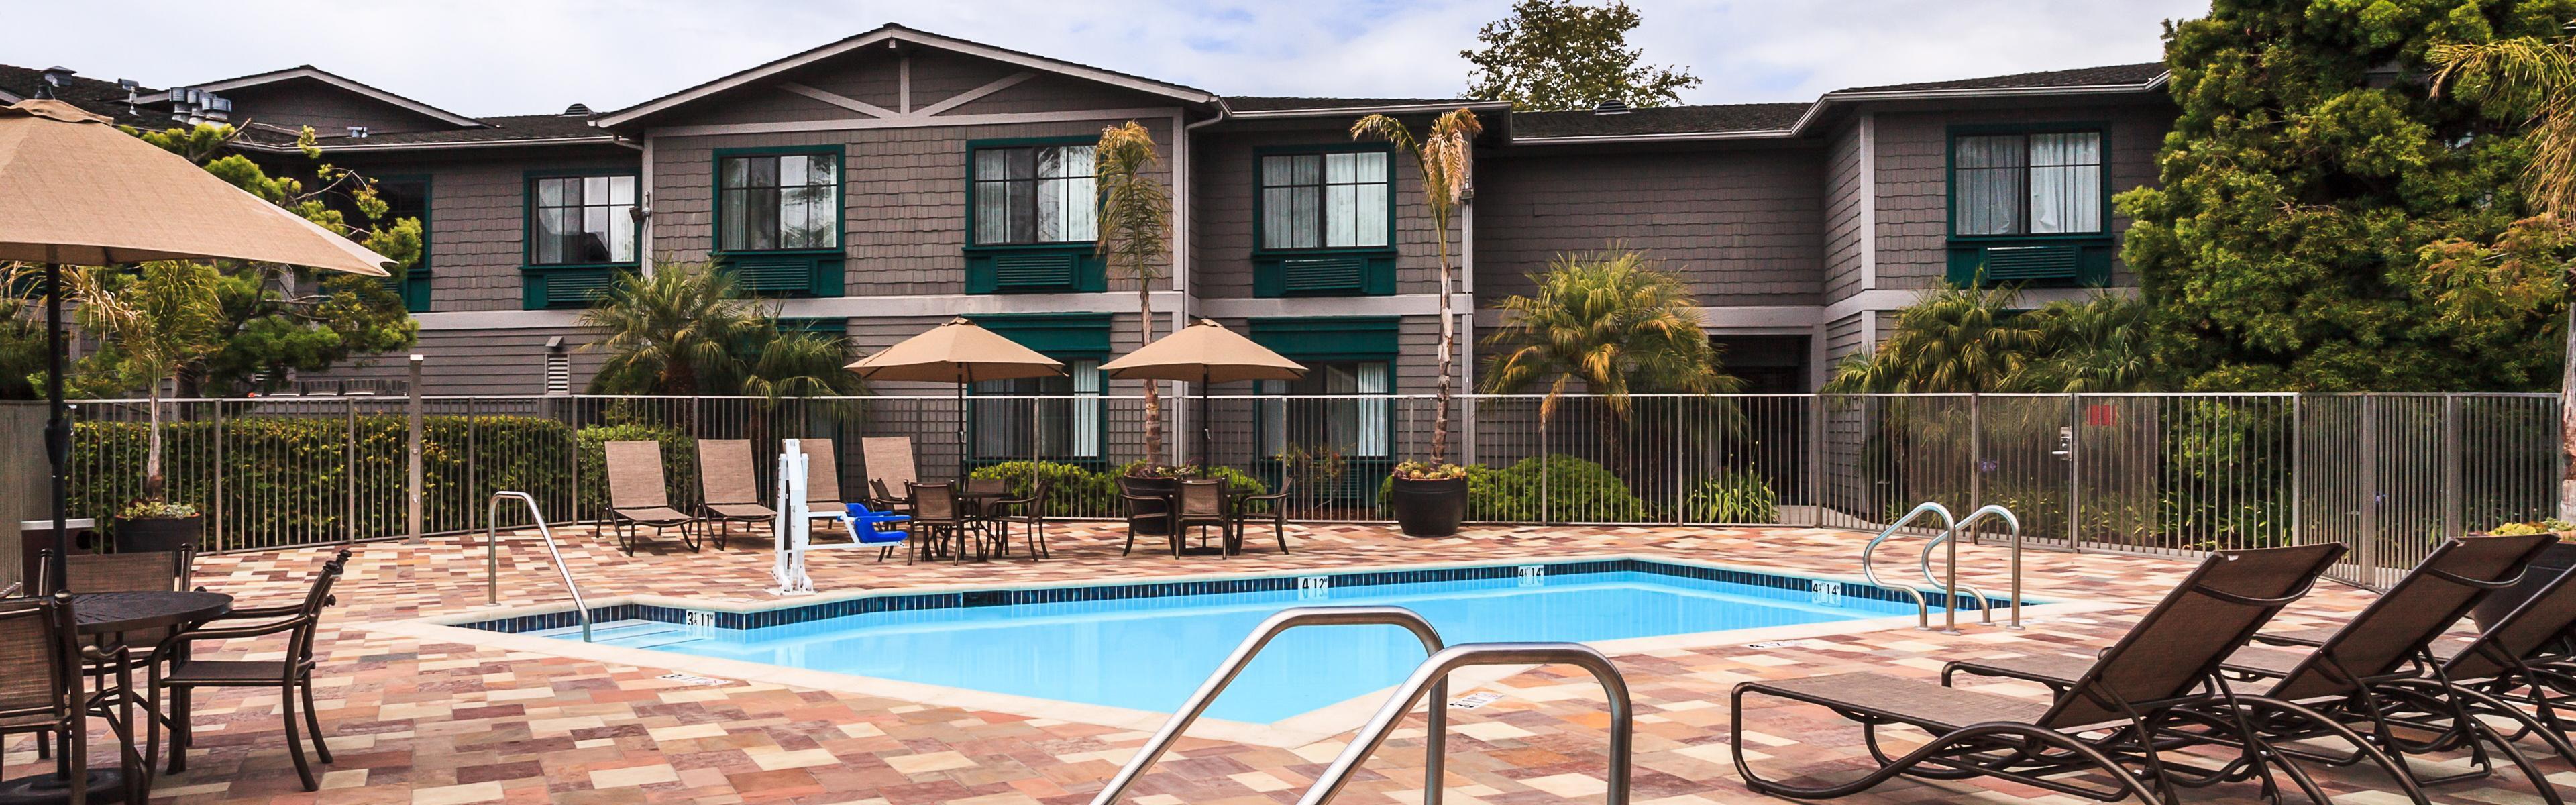 Holiday Inn Express & Suites Carpinteria image 2